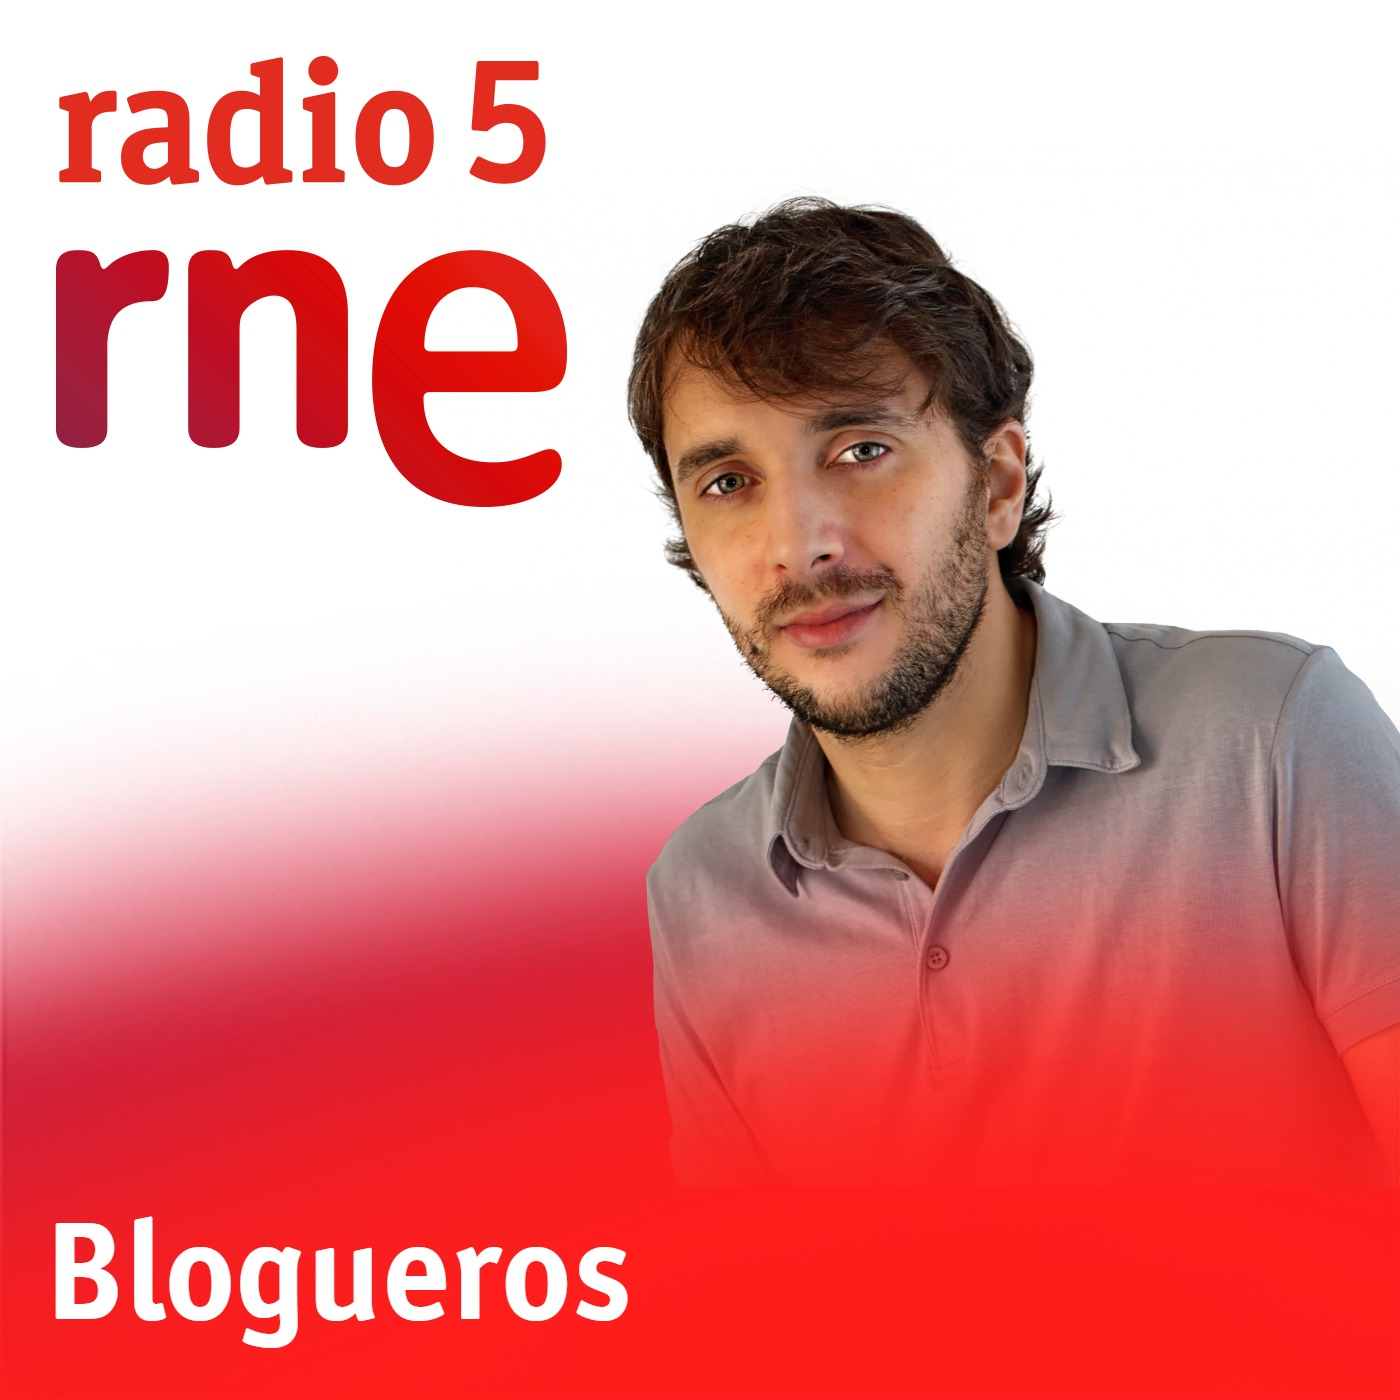 Blogueros - Binaural.es - 14/04/16